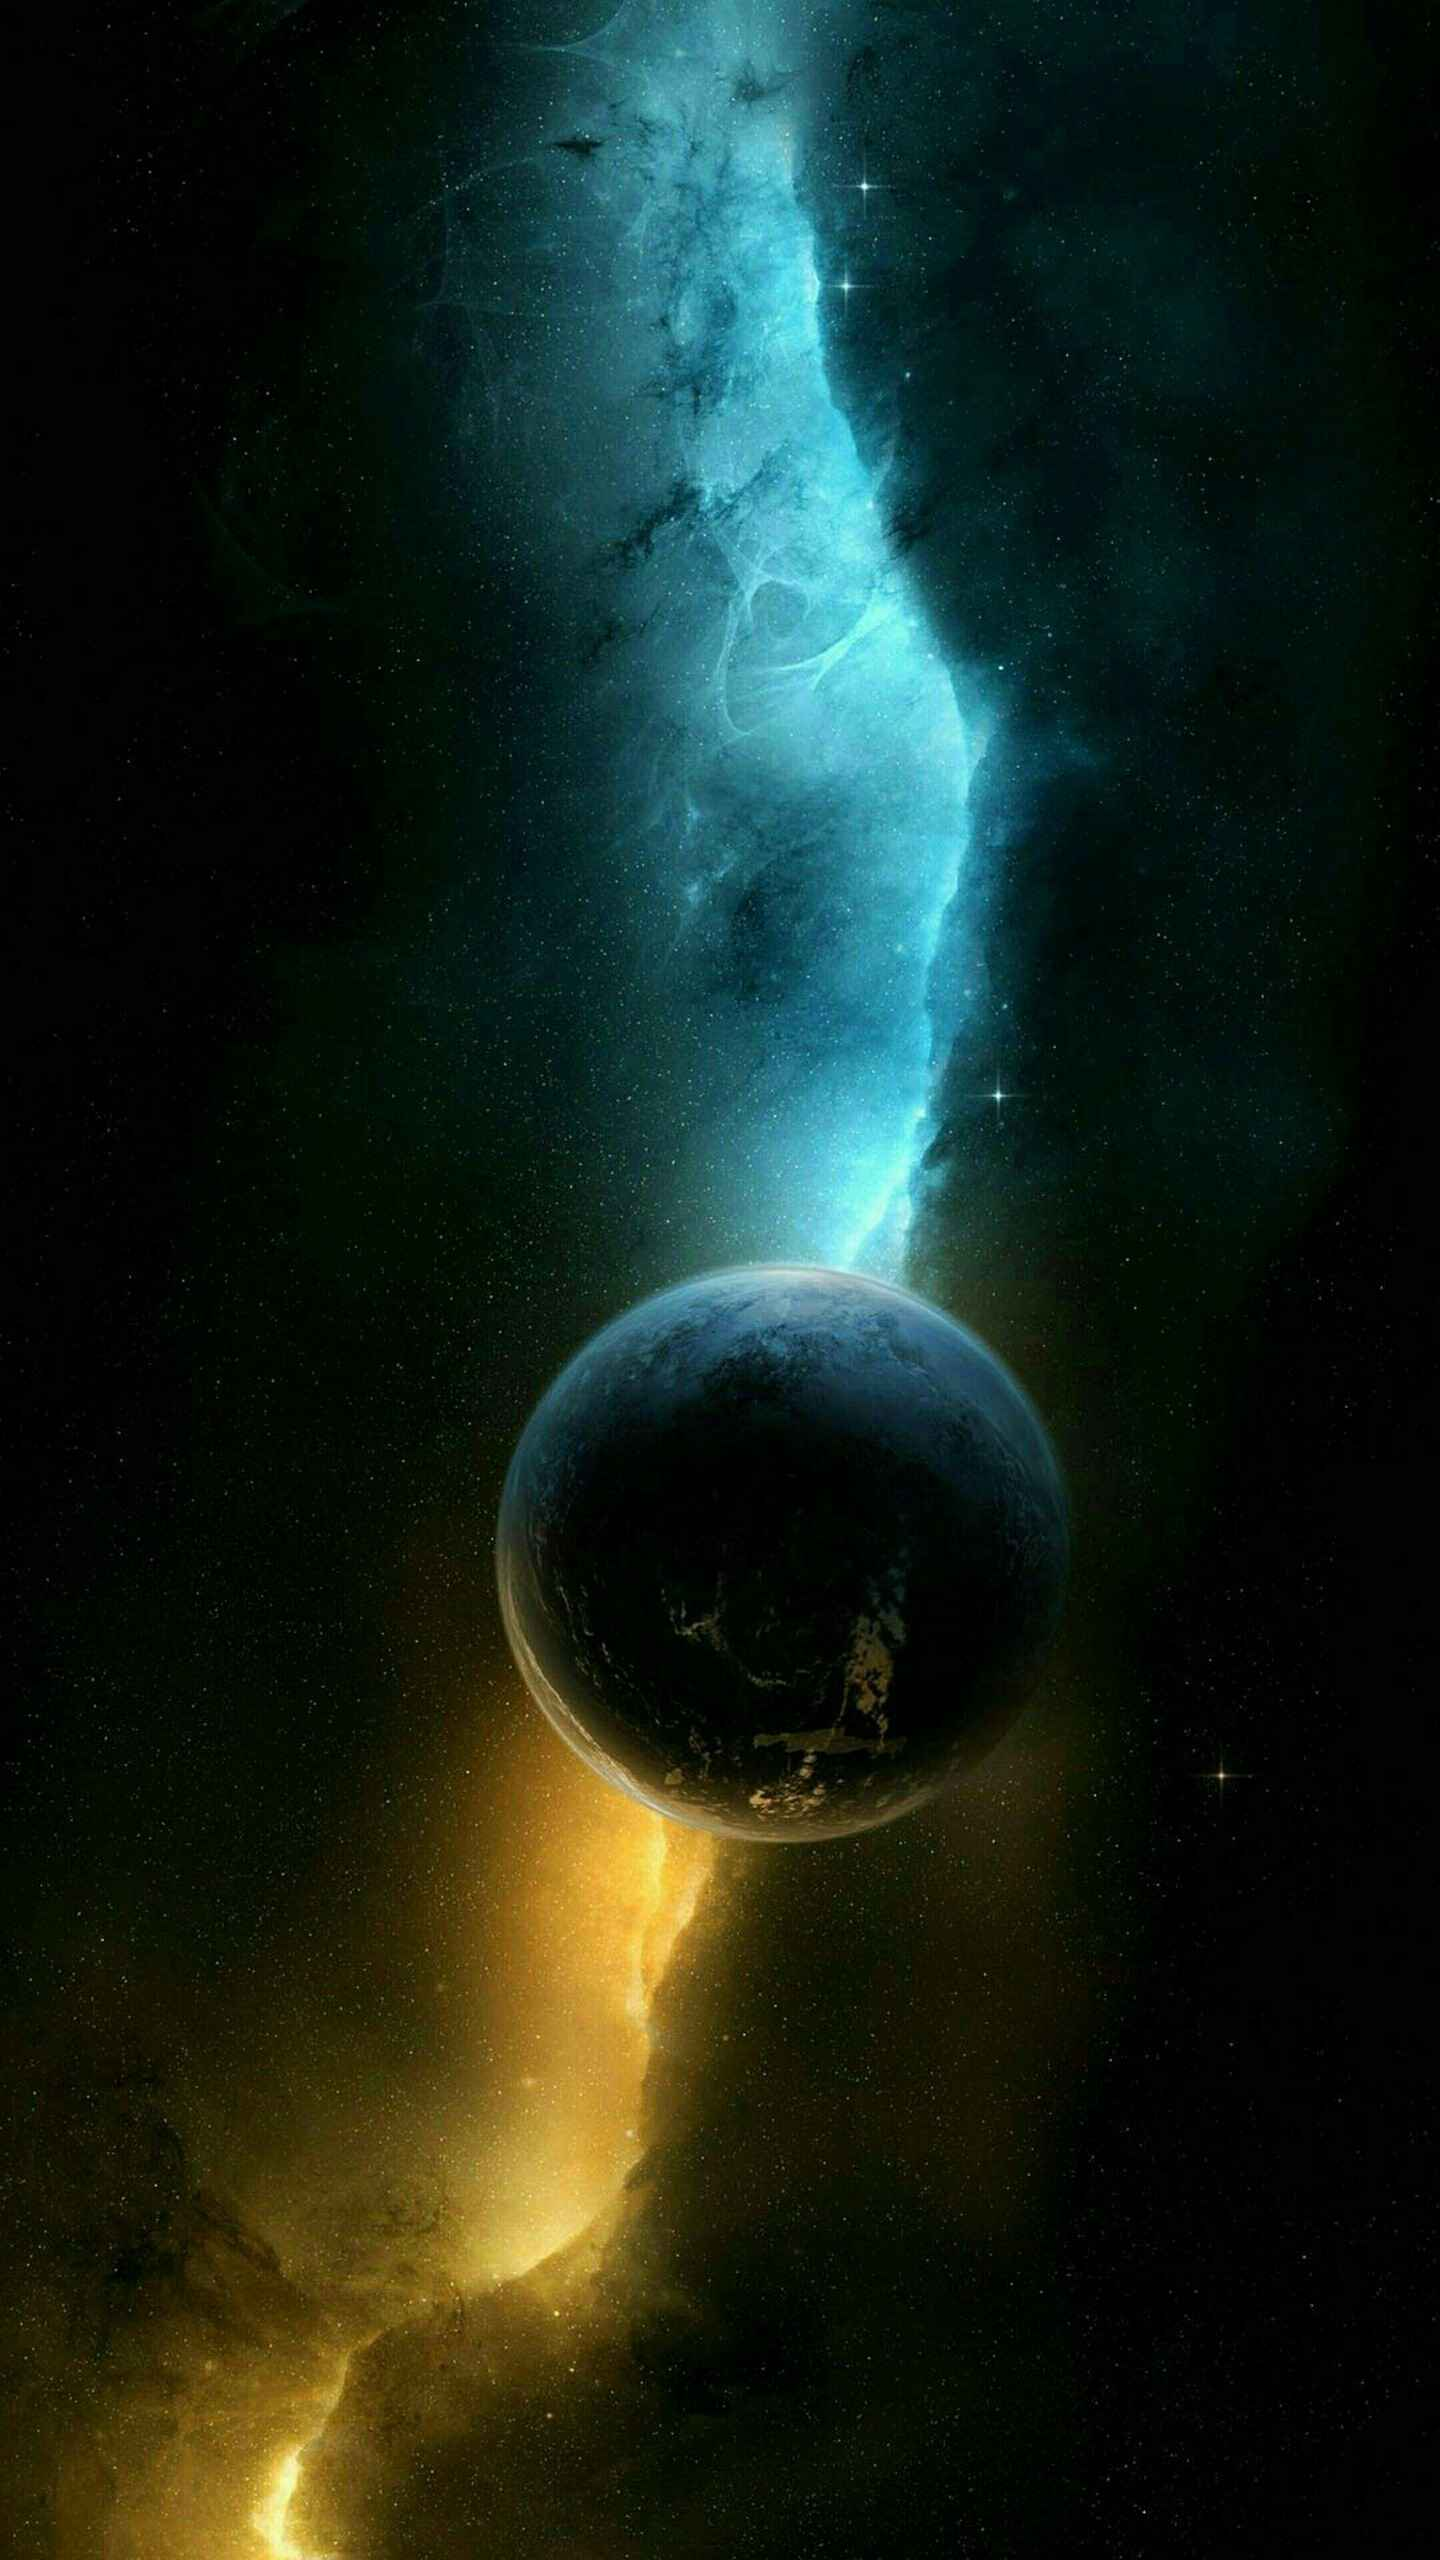 Space Planet Nebula iPhone Wallpaper